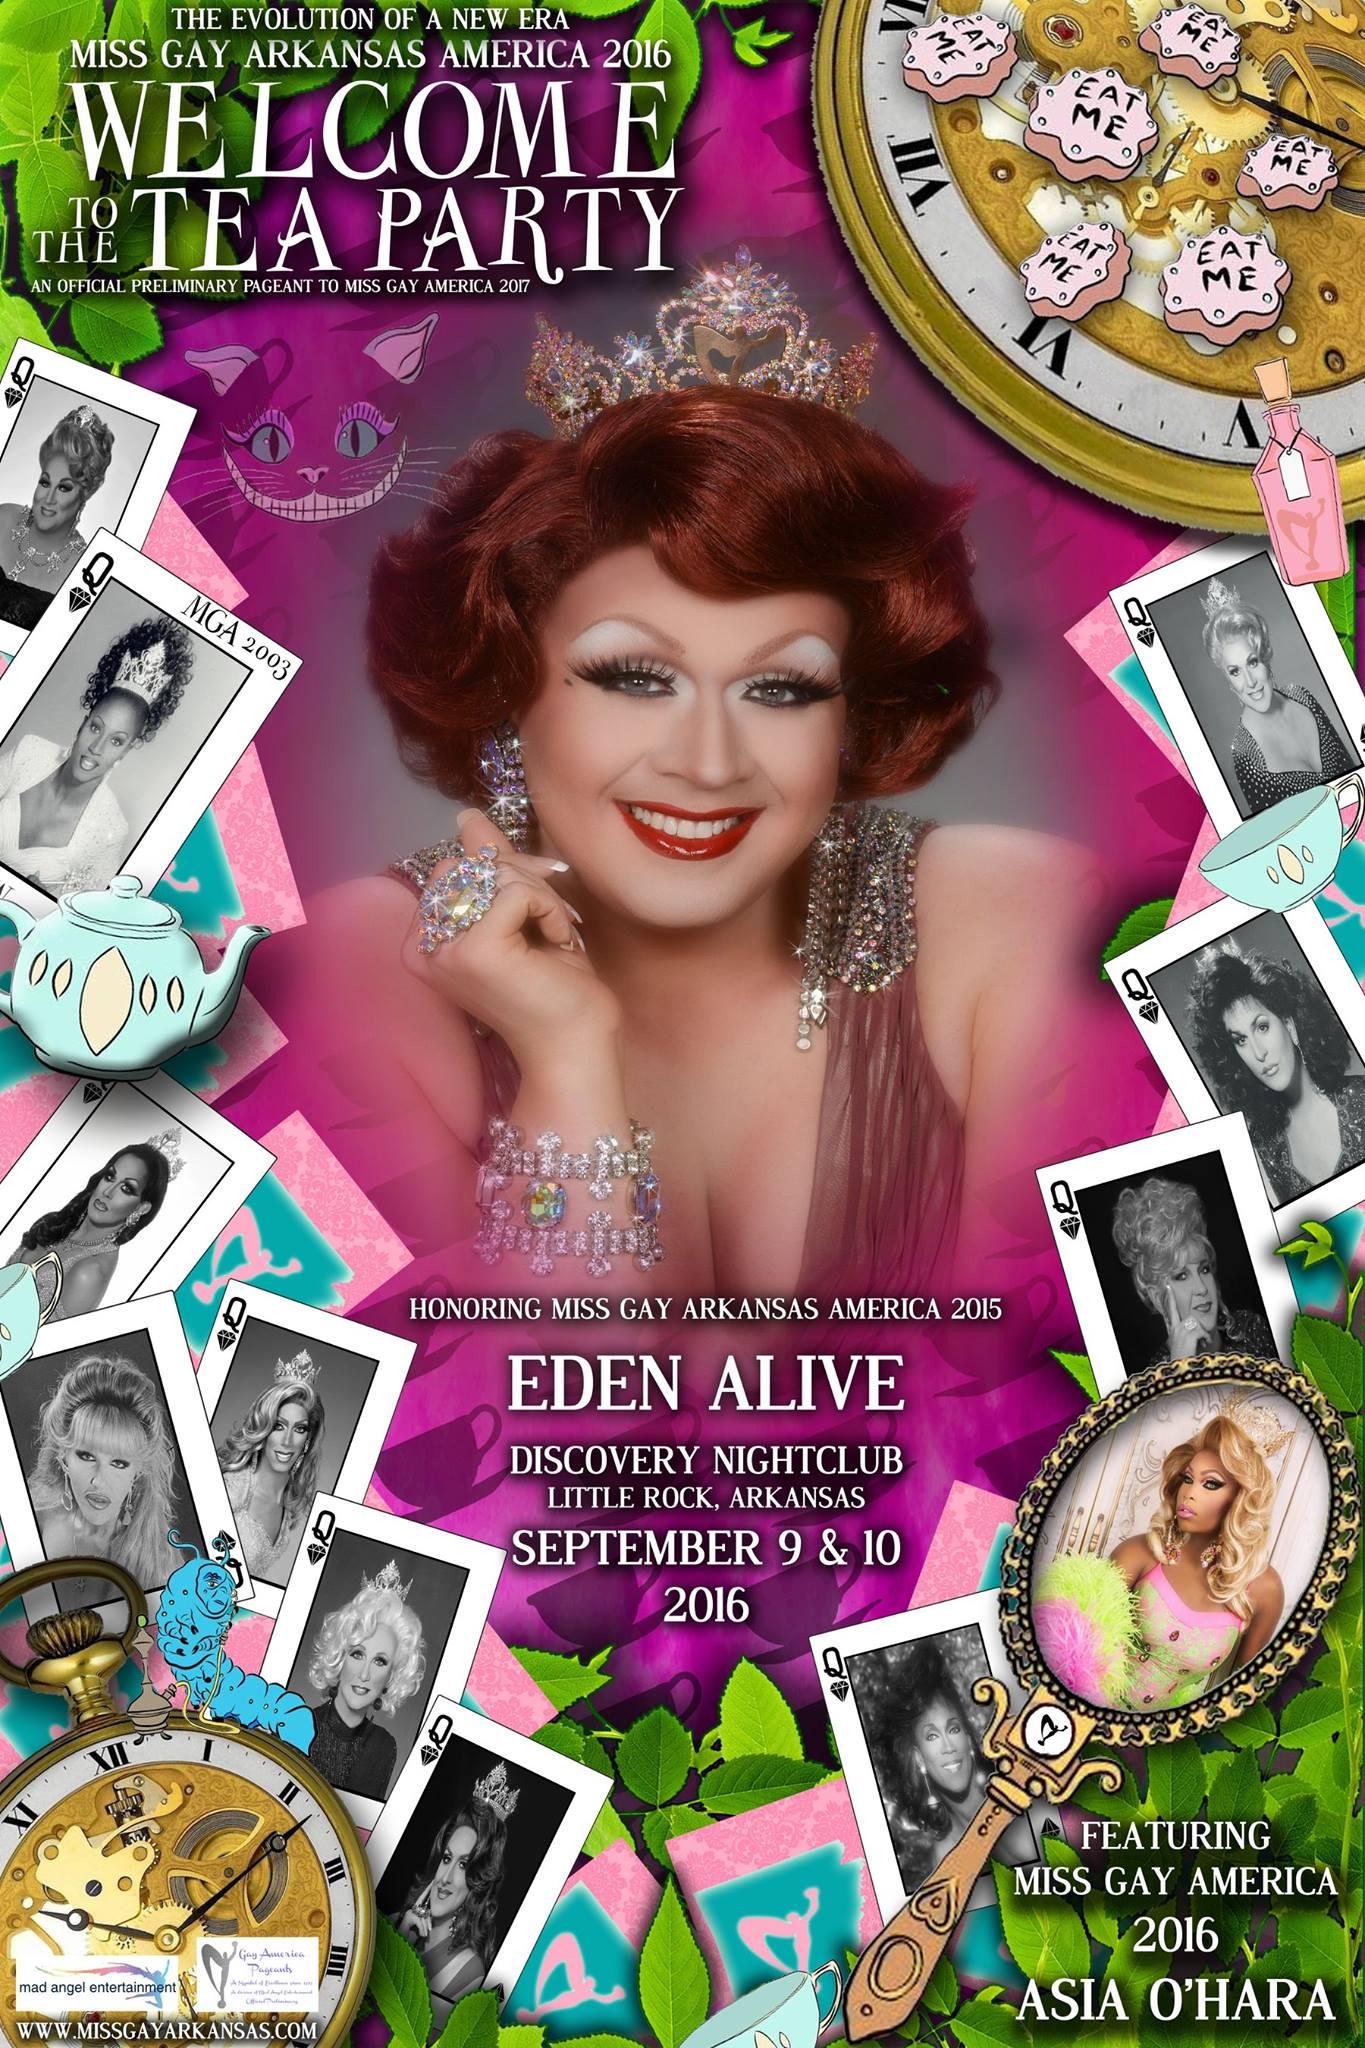 Show Ad | Miss Gay Arkansas America | Discovery Nightclub (Little Rock, Arkansas) | 9/9-9/10/2016